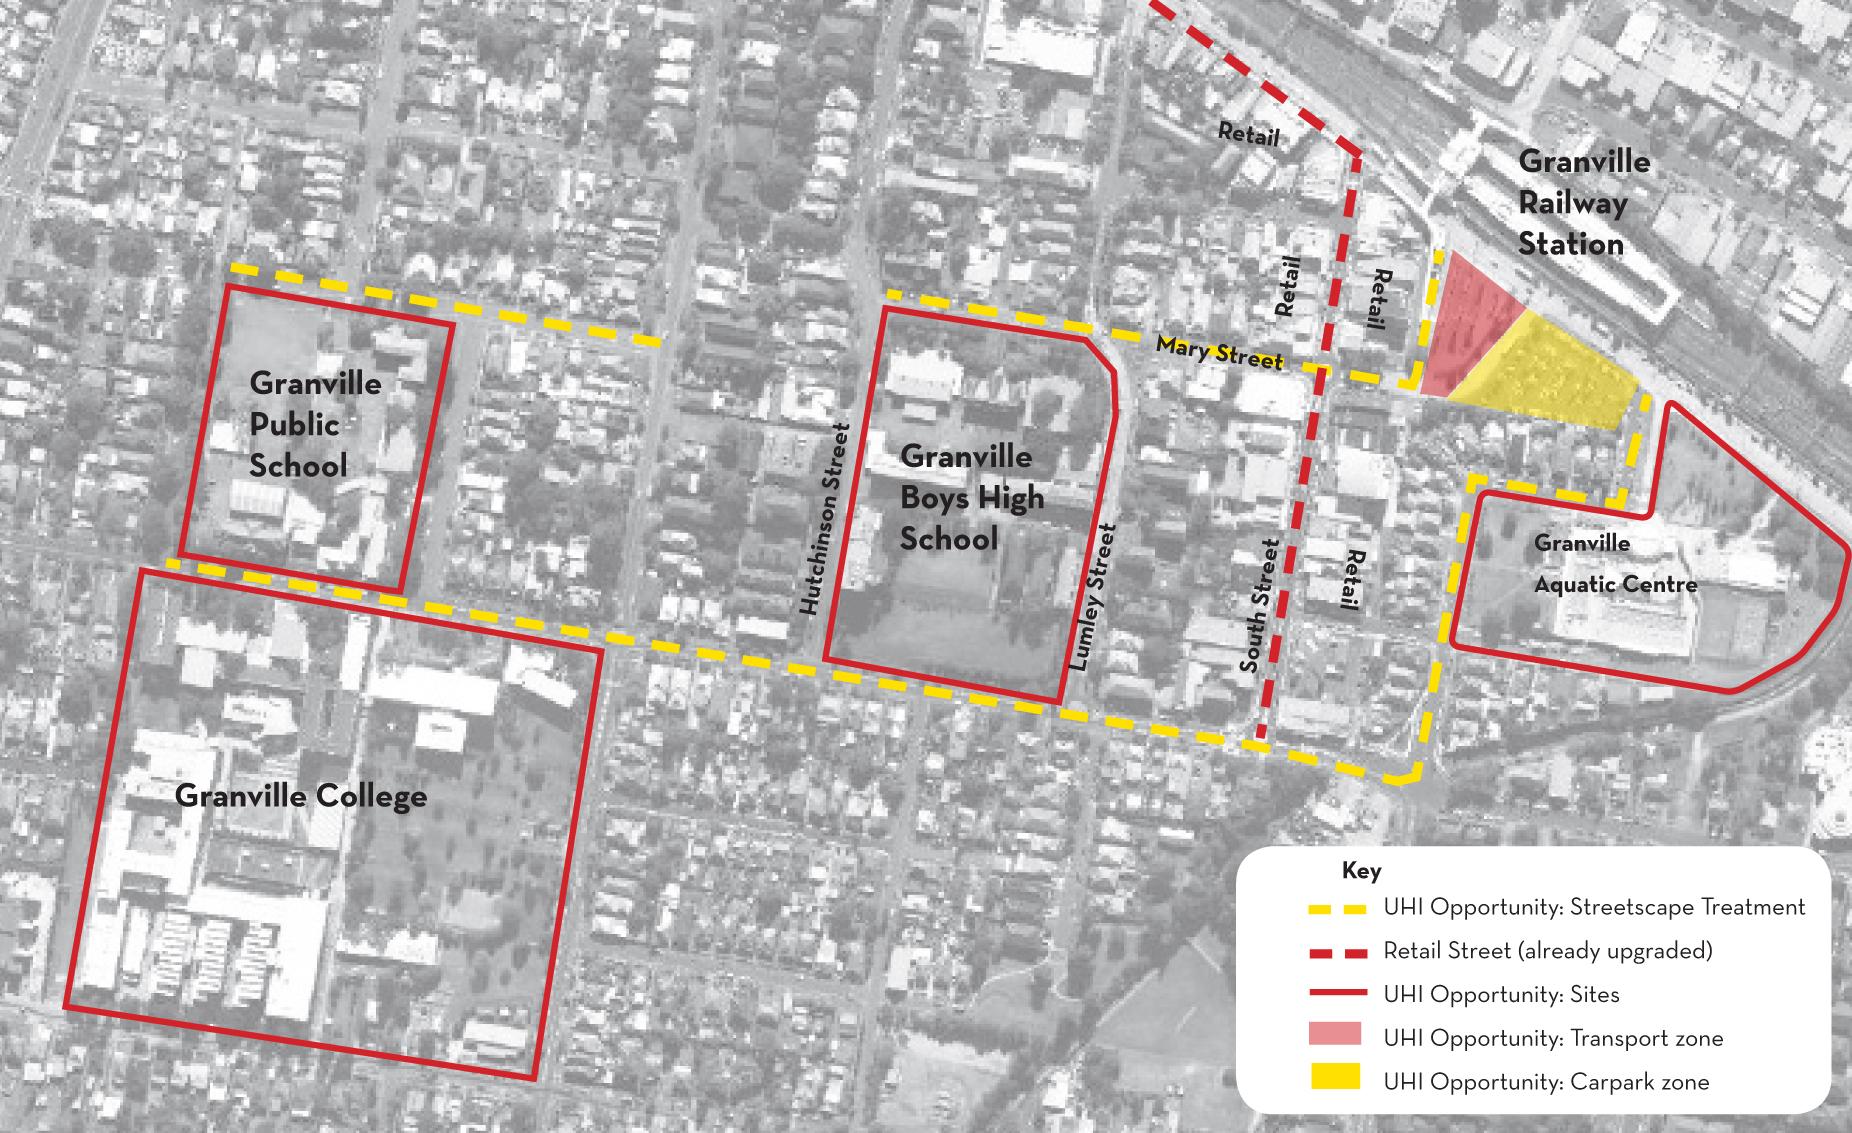 Sample opportunity plan for the Granville Precinct